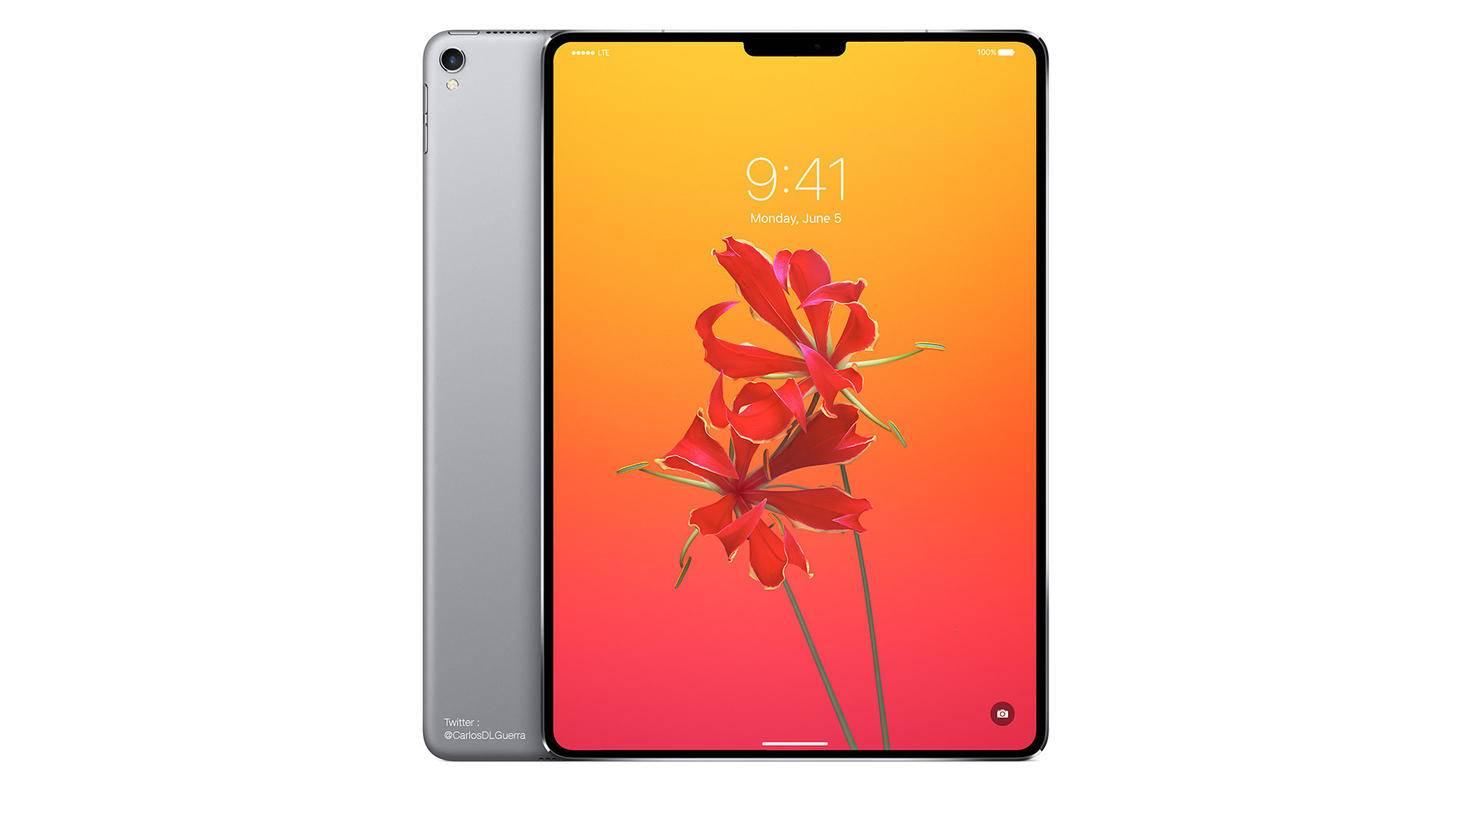 iPad Pro Face ID